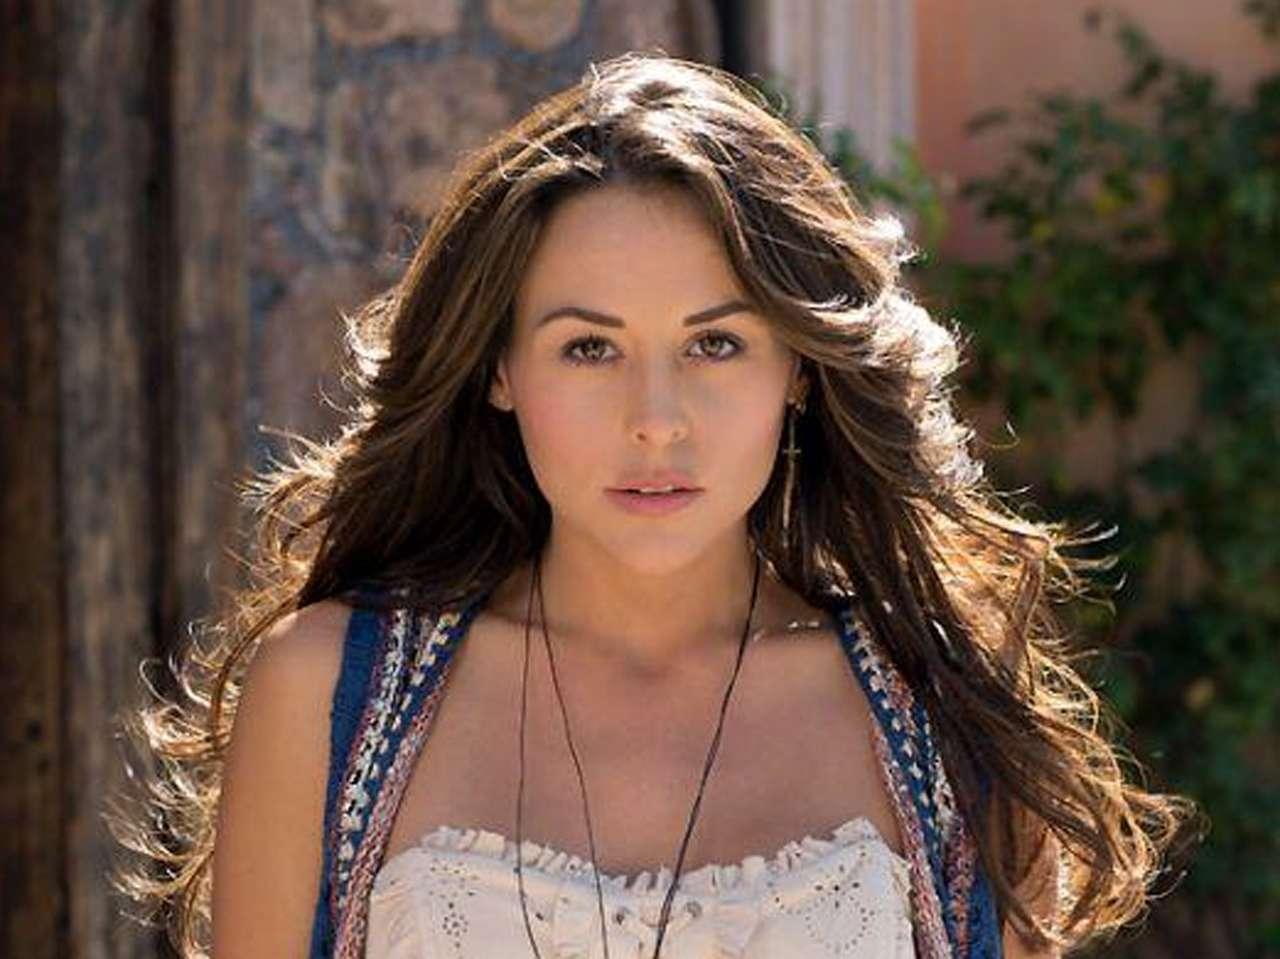 Zuria Vega es 'Abigail' en la telenovela de Univisión y Televisa. Foto: Twitter/@zuriavvega